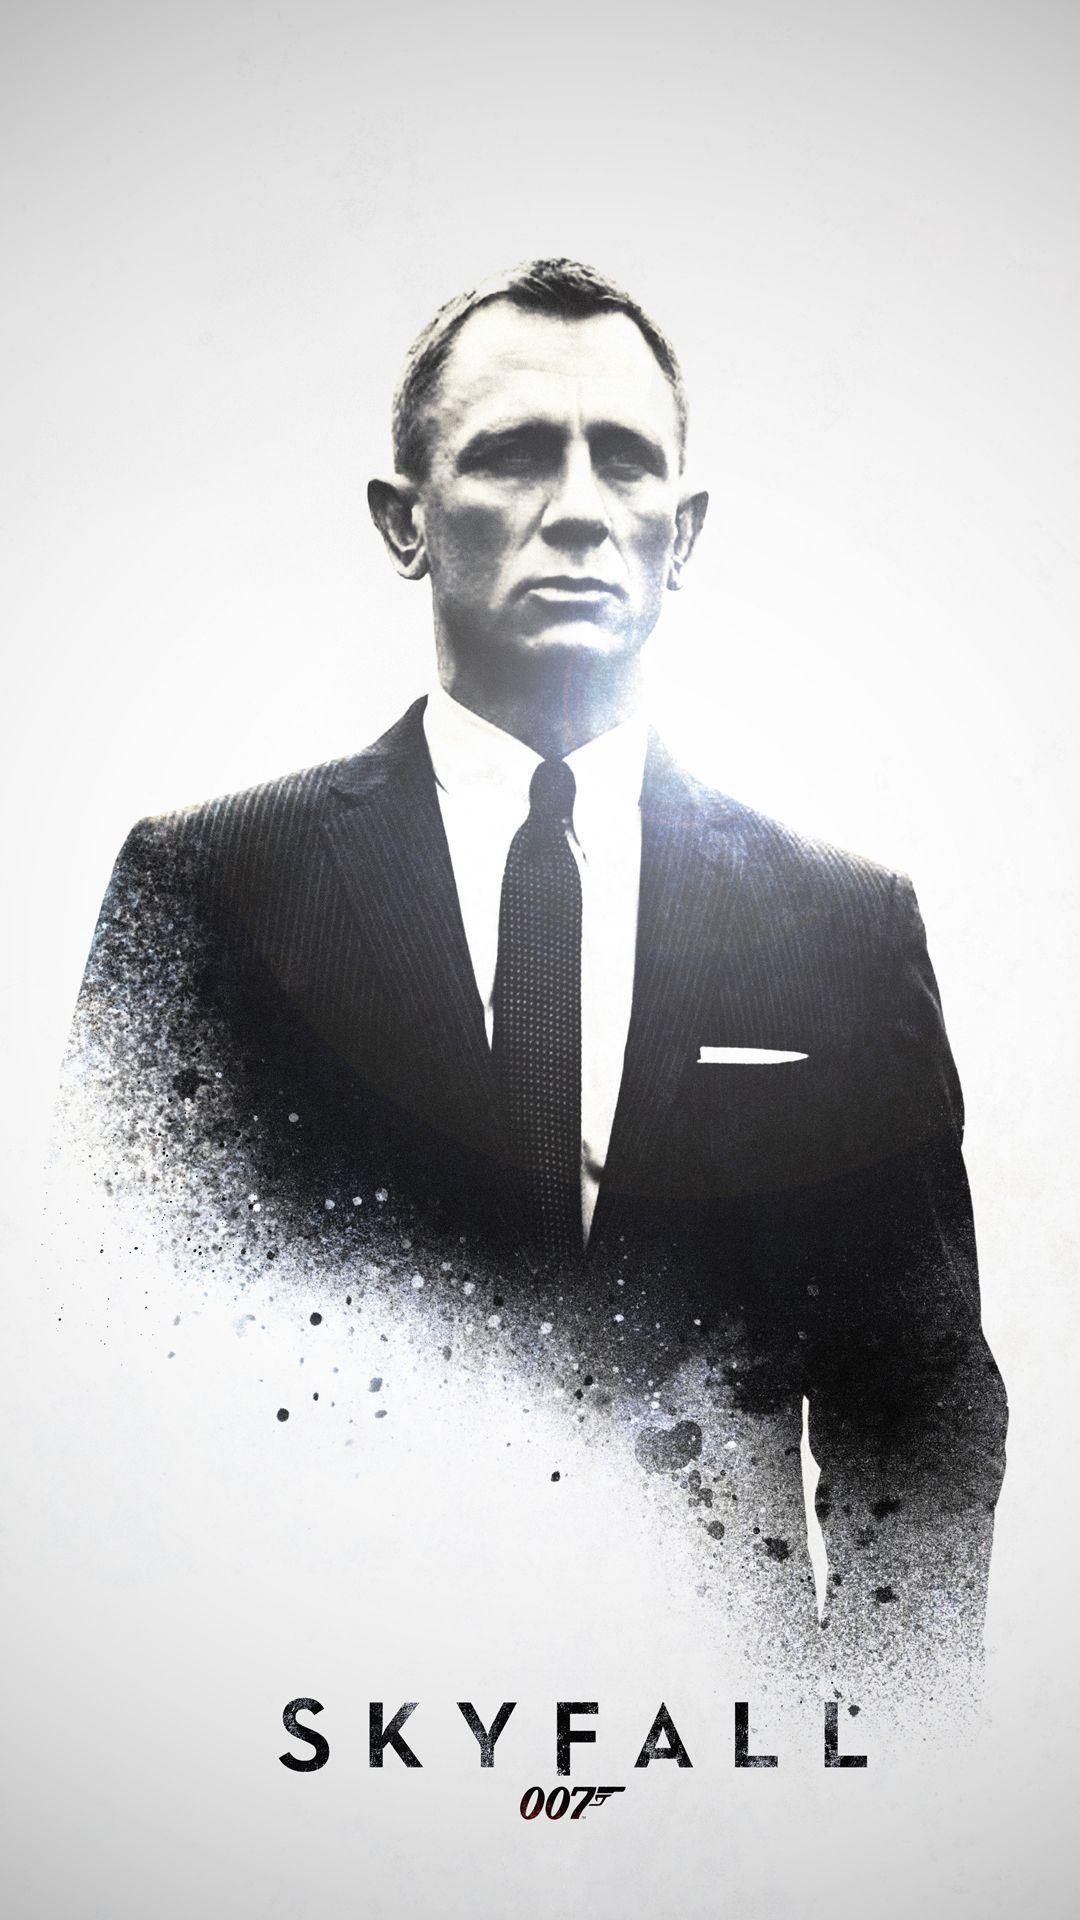 wallpaper 007